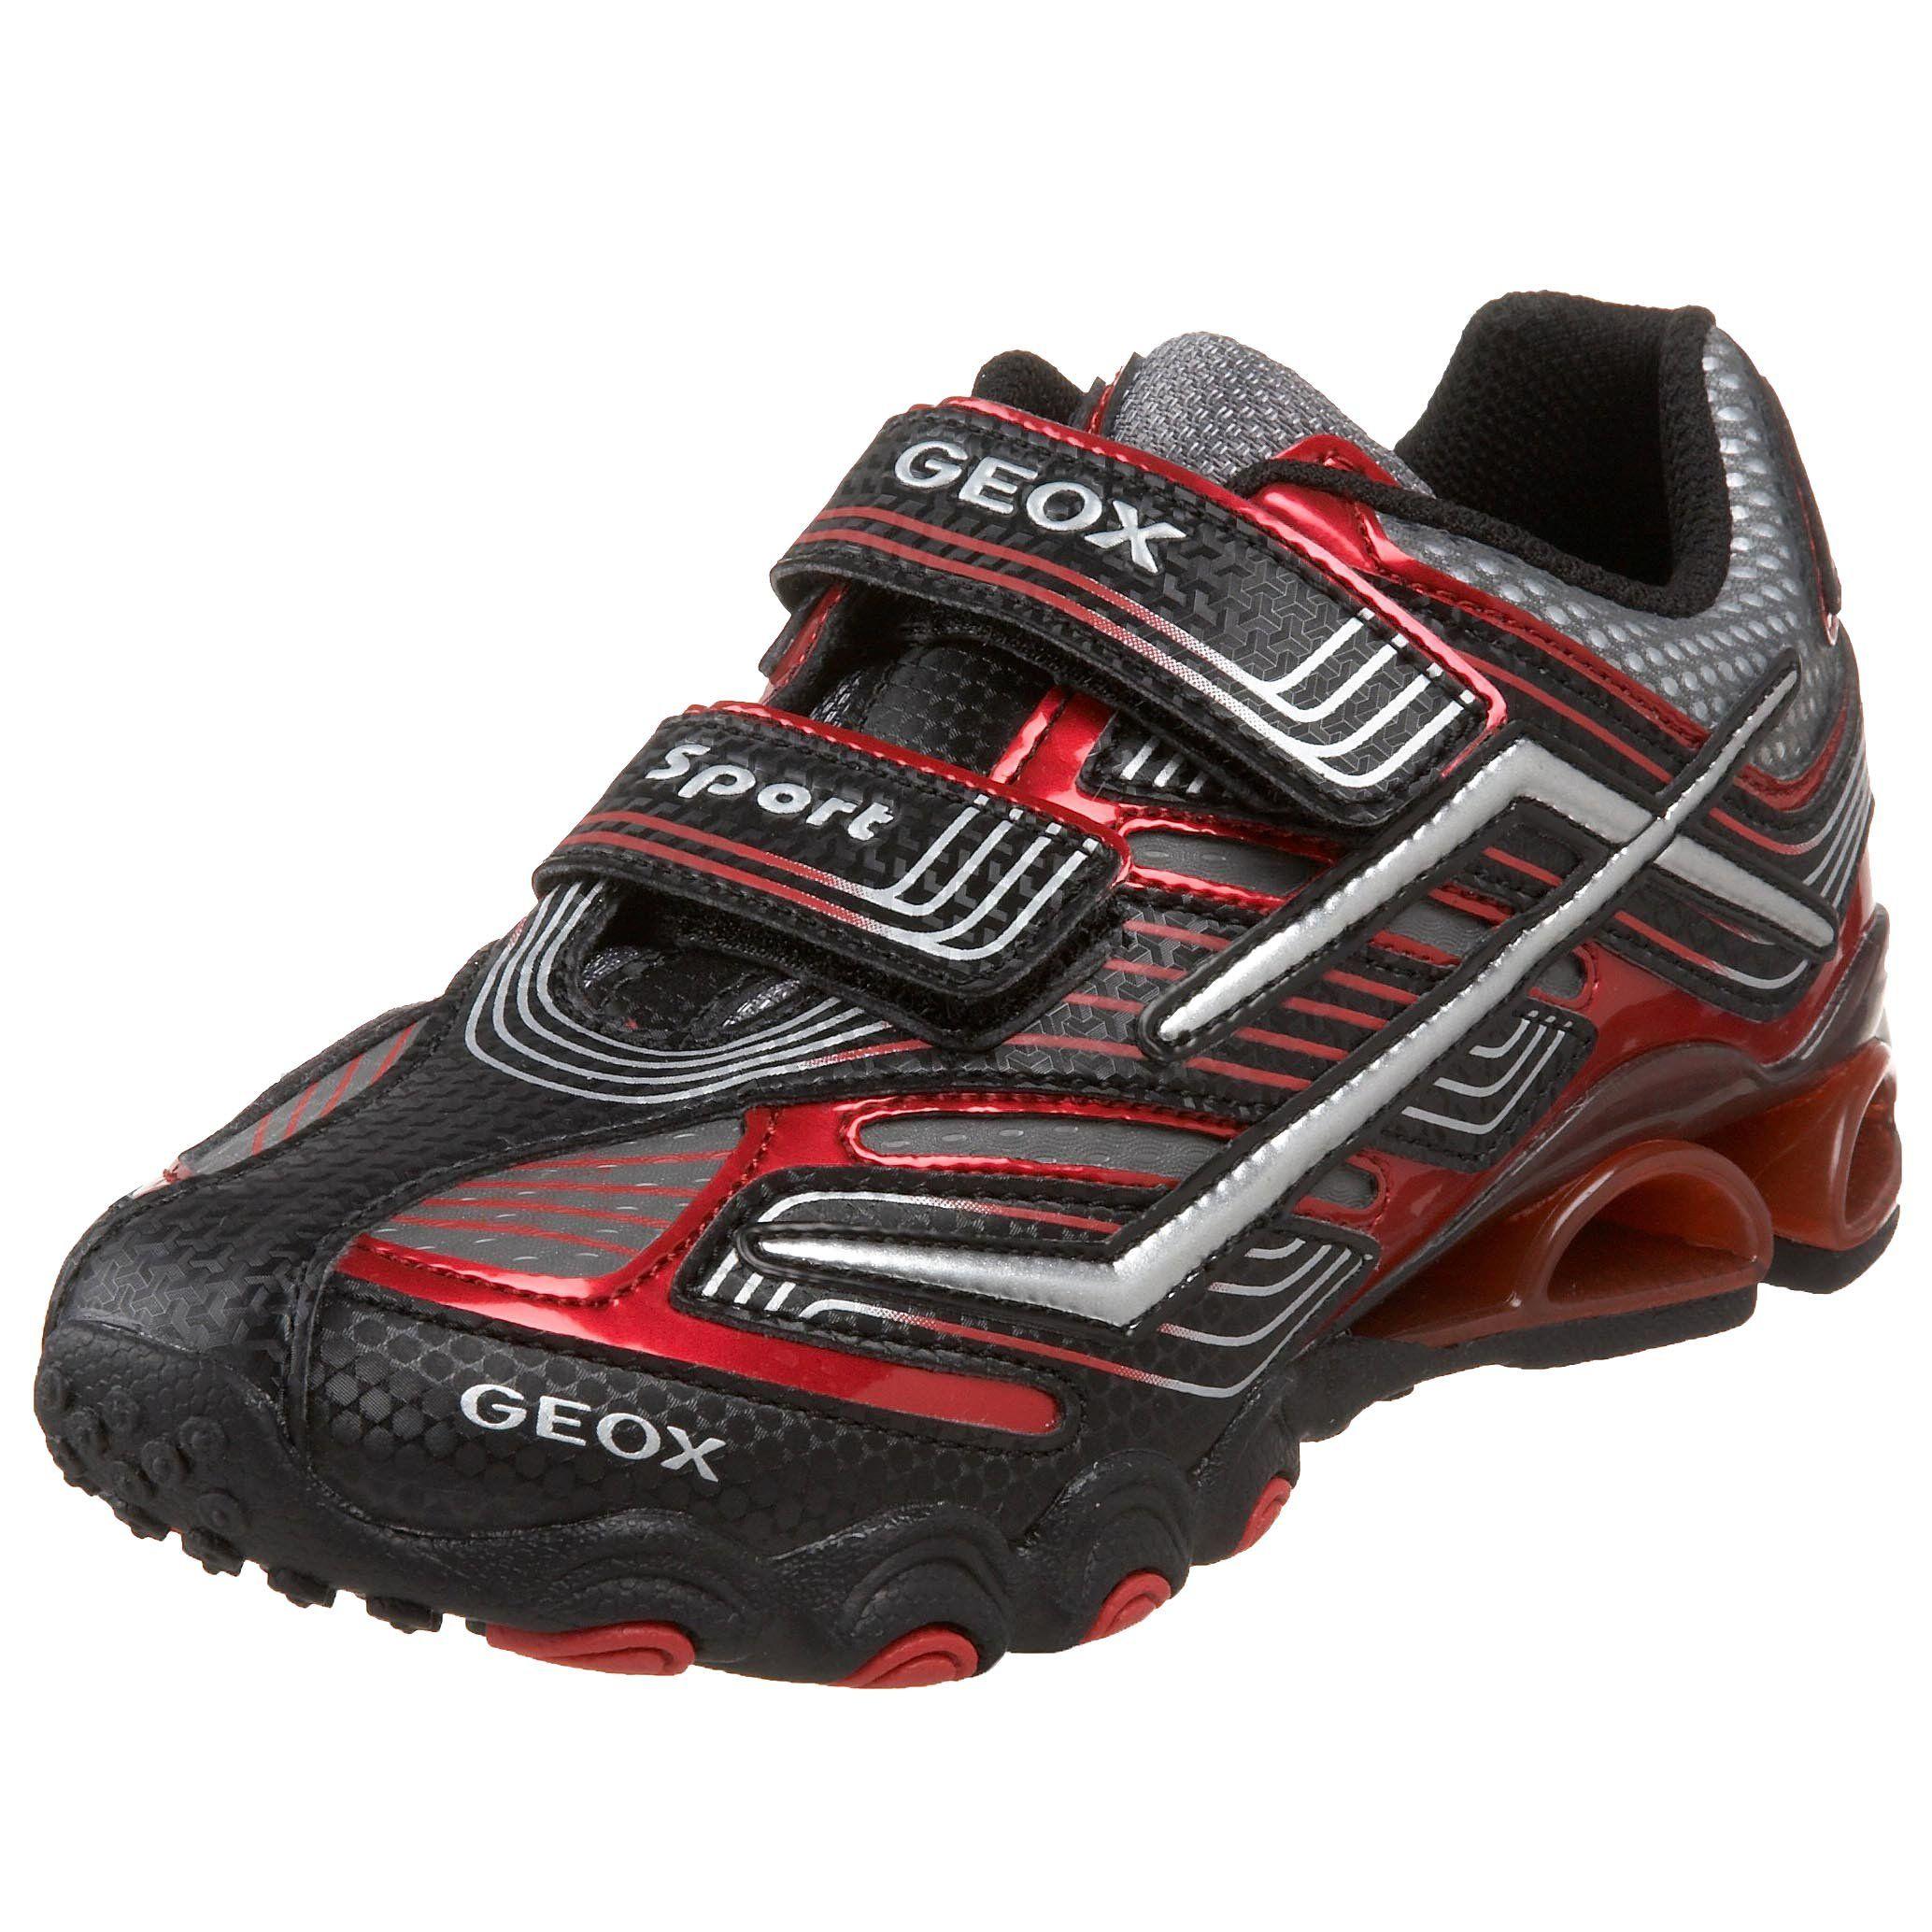 newest collection 33677 fd103 Geox Little Kid/Big Kid Tornado Sneaker,Black/Red,28 EU ...